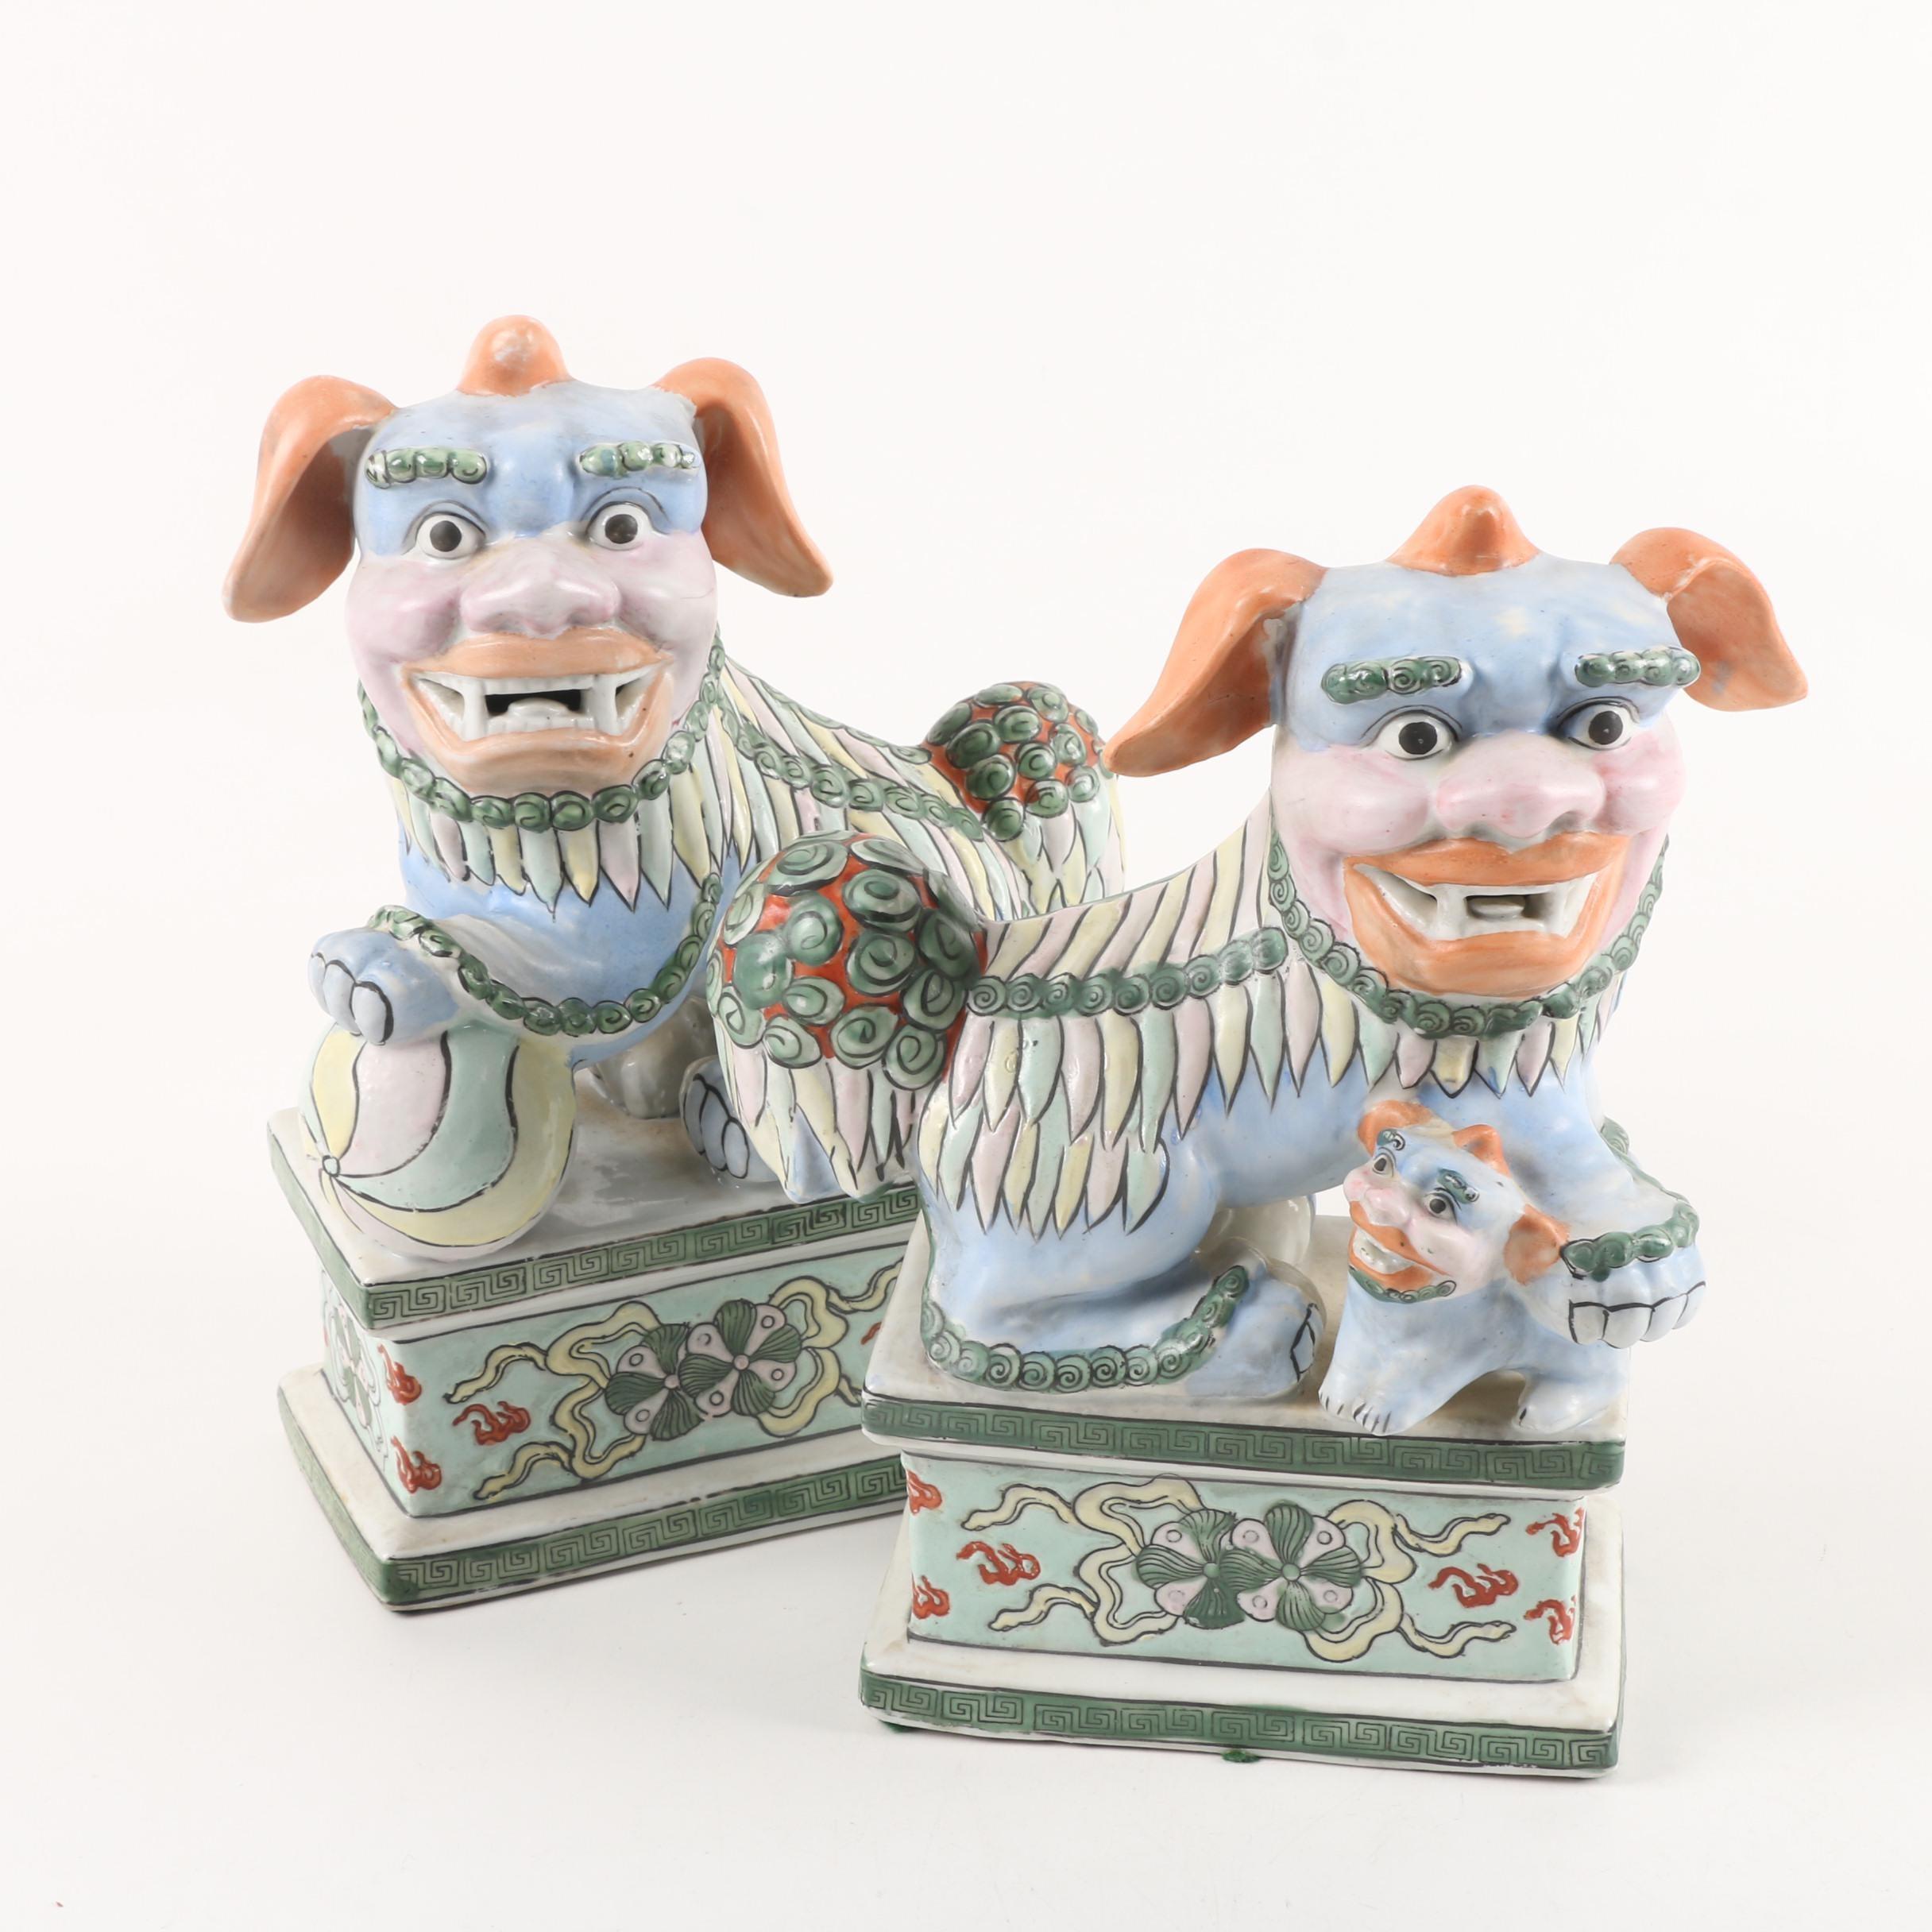 Vintage Chinese Ceramic Guardian Lion Figurines